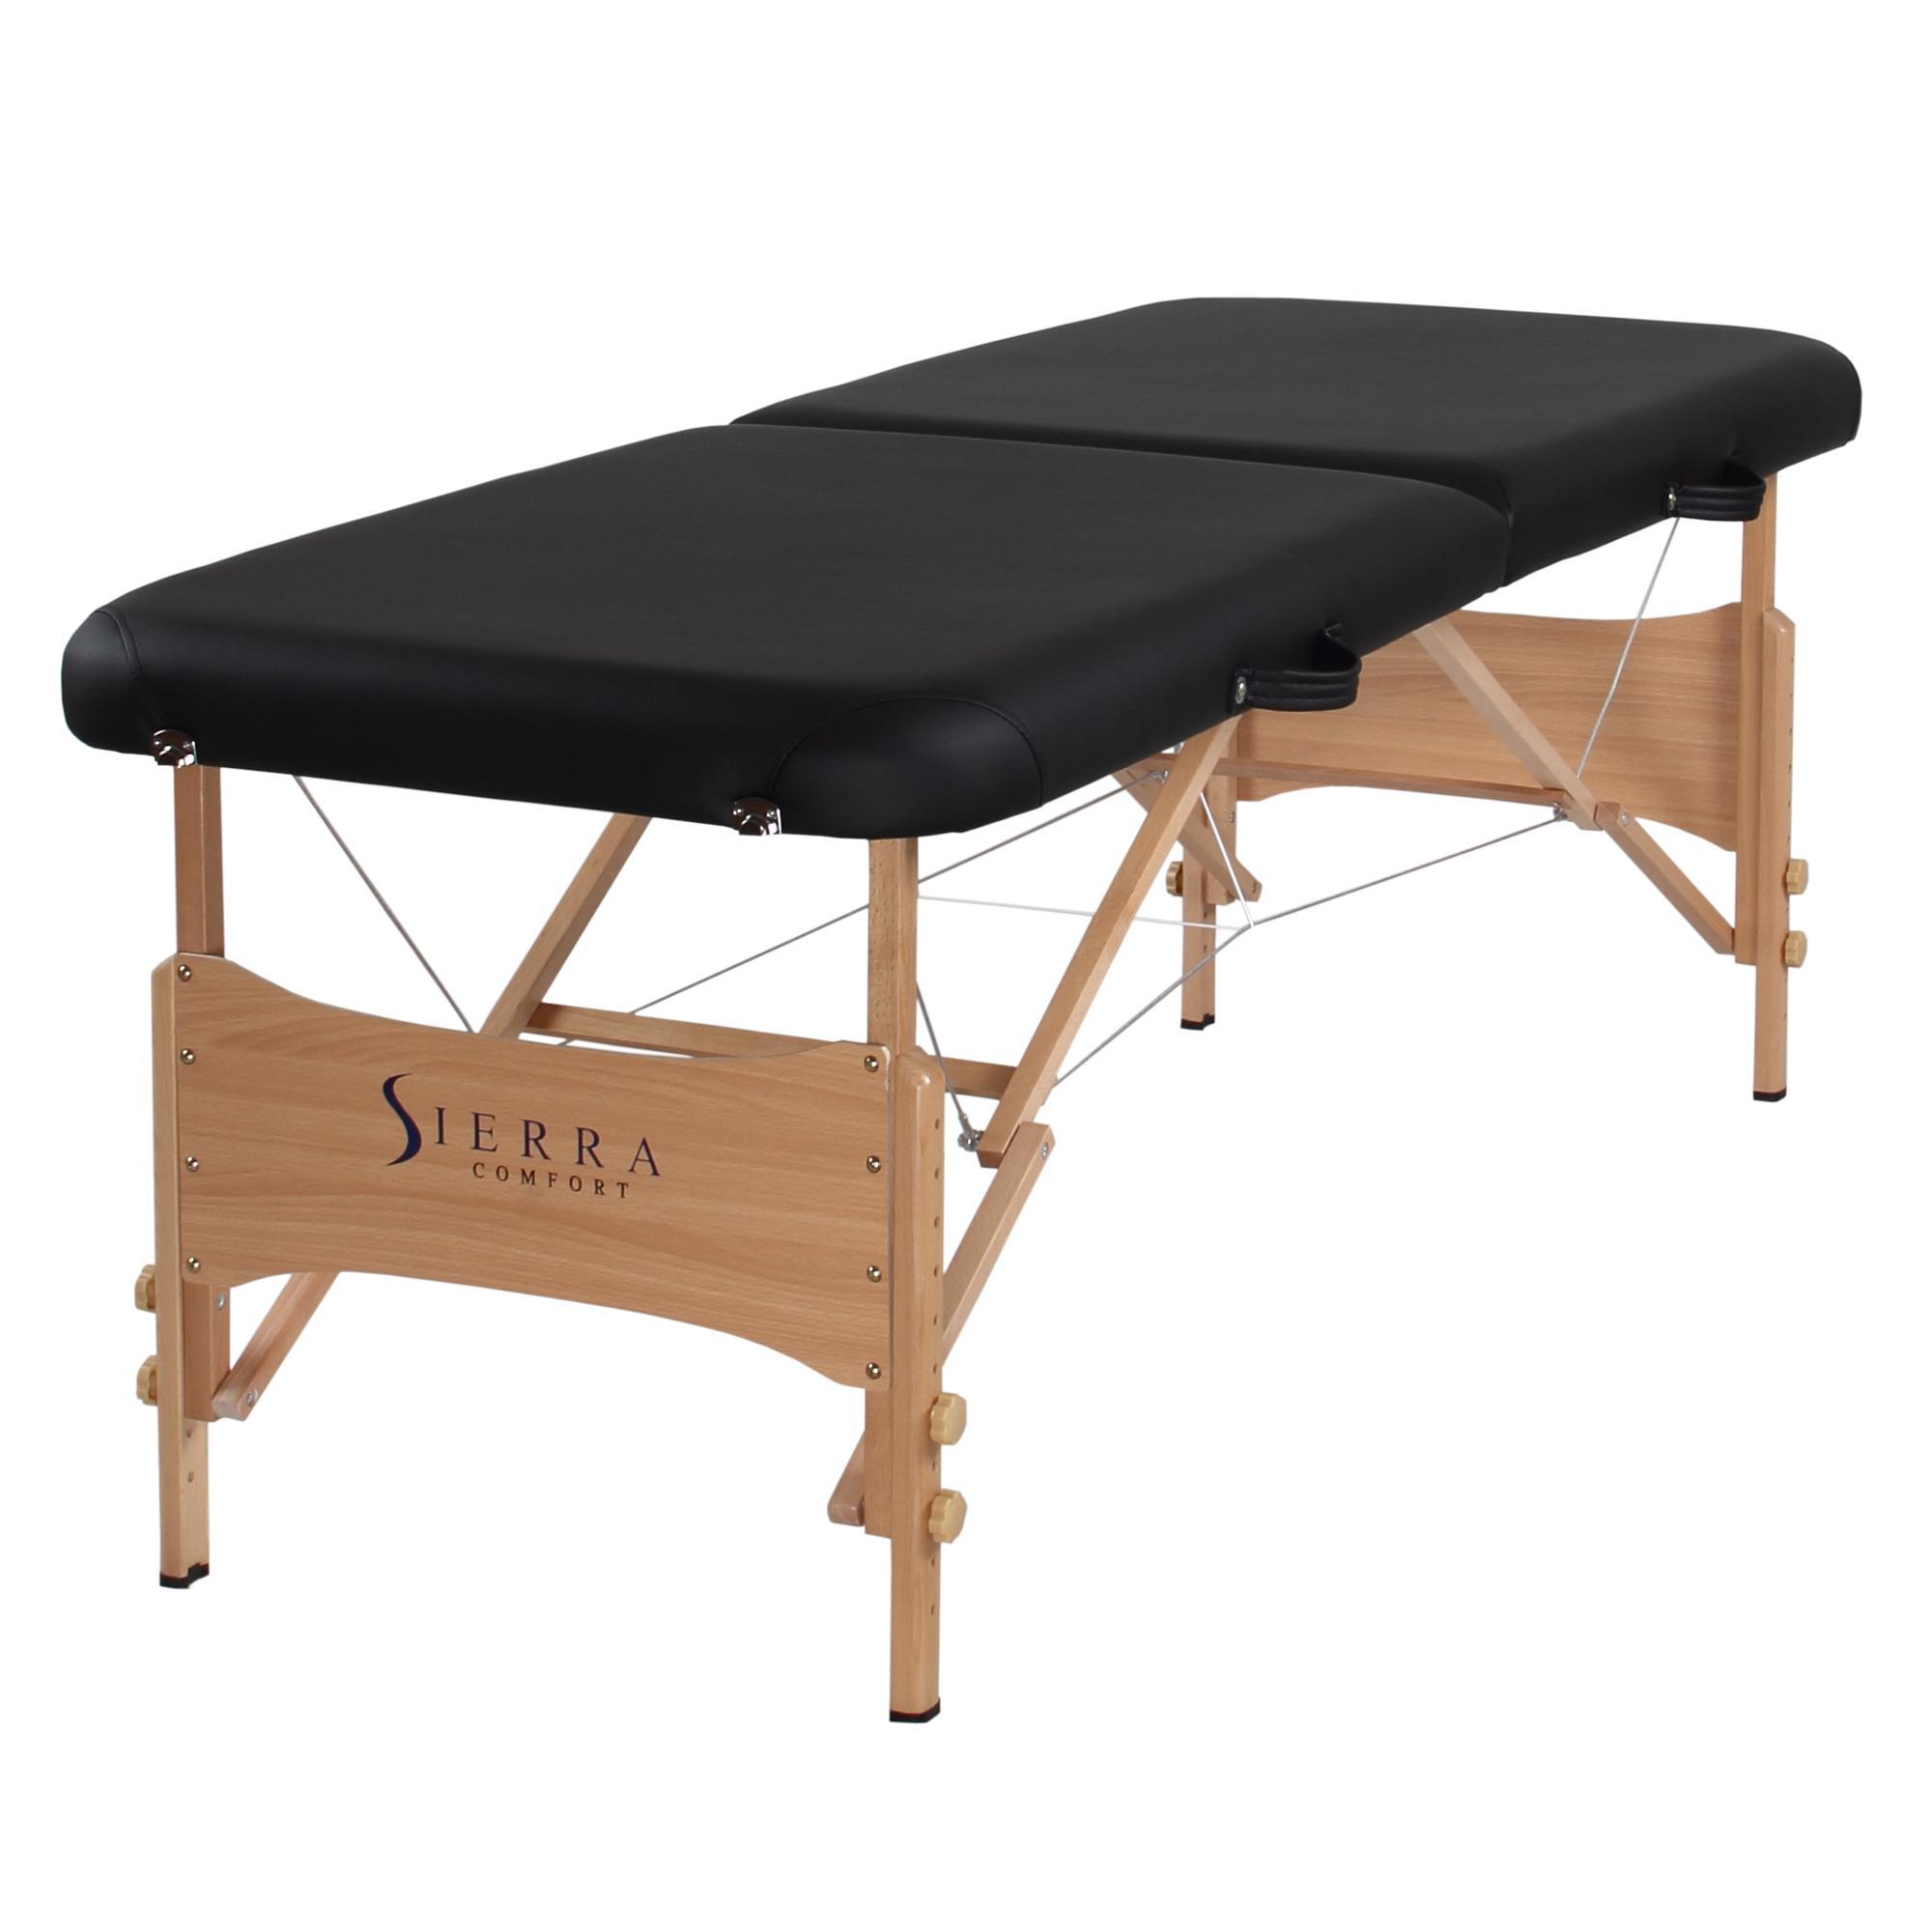 Lightweight portable massage table - Sierra Comfort Sc 500 Basic Folding Portable Massage Table